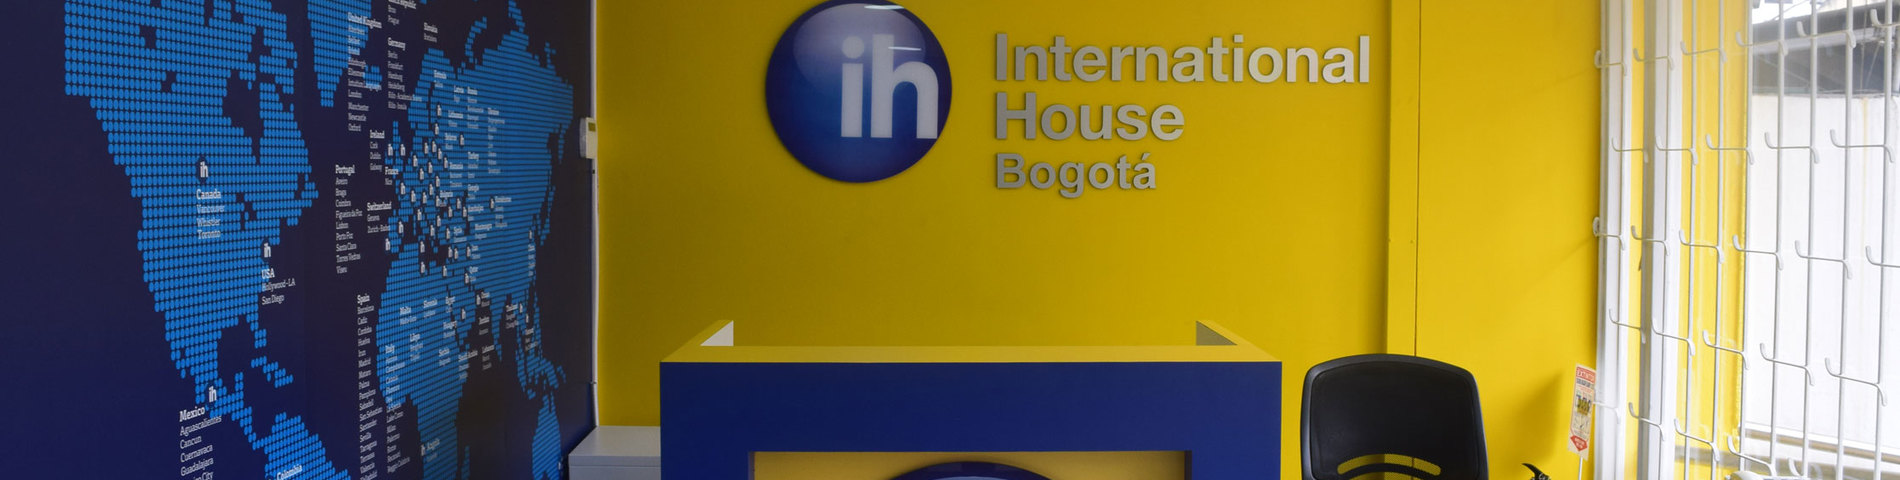 International House Bogota صورة 1